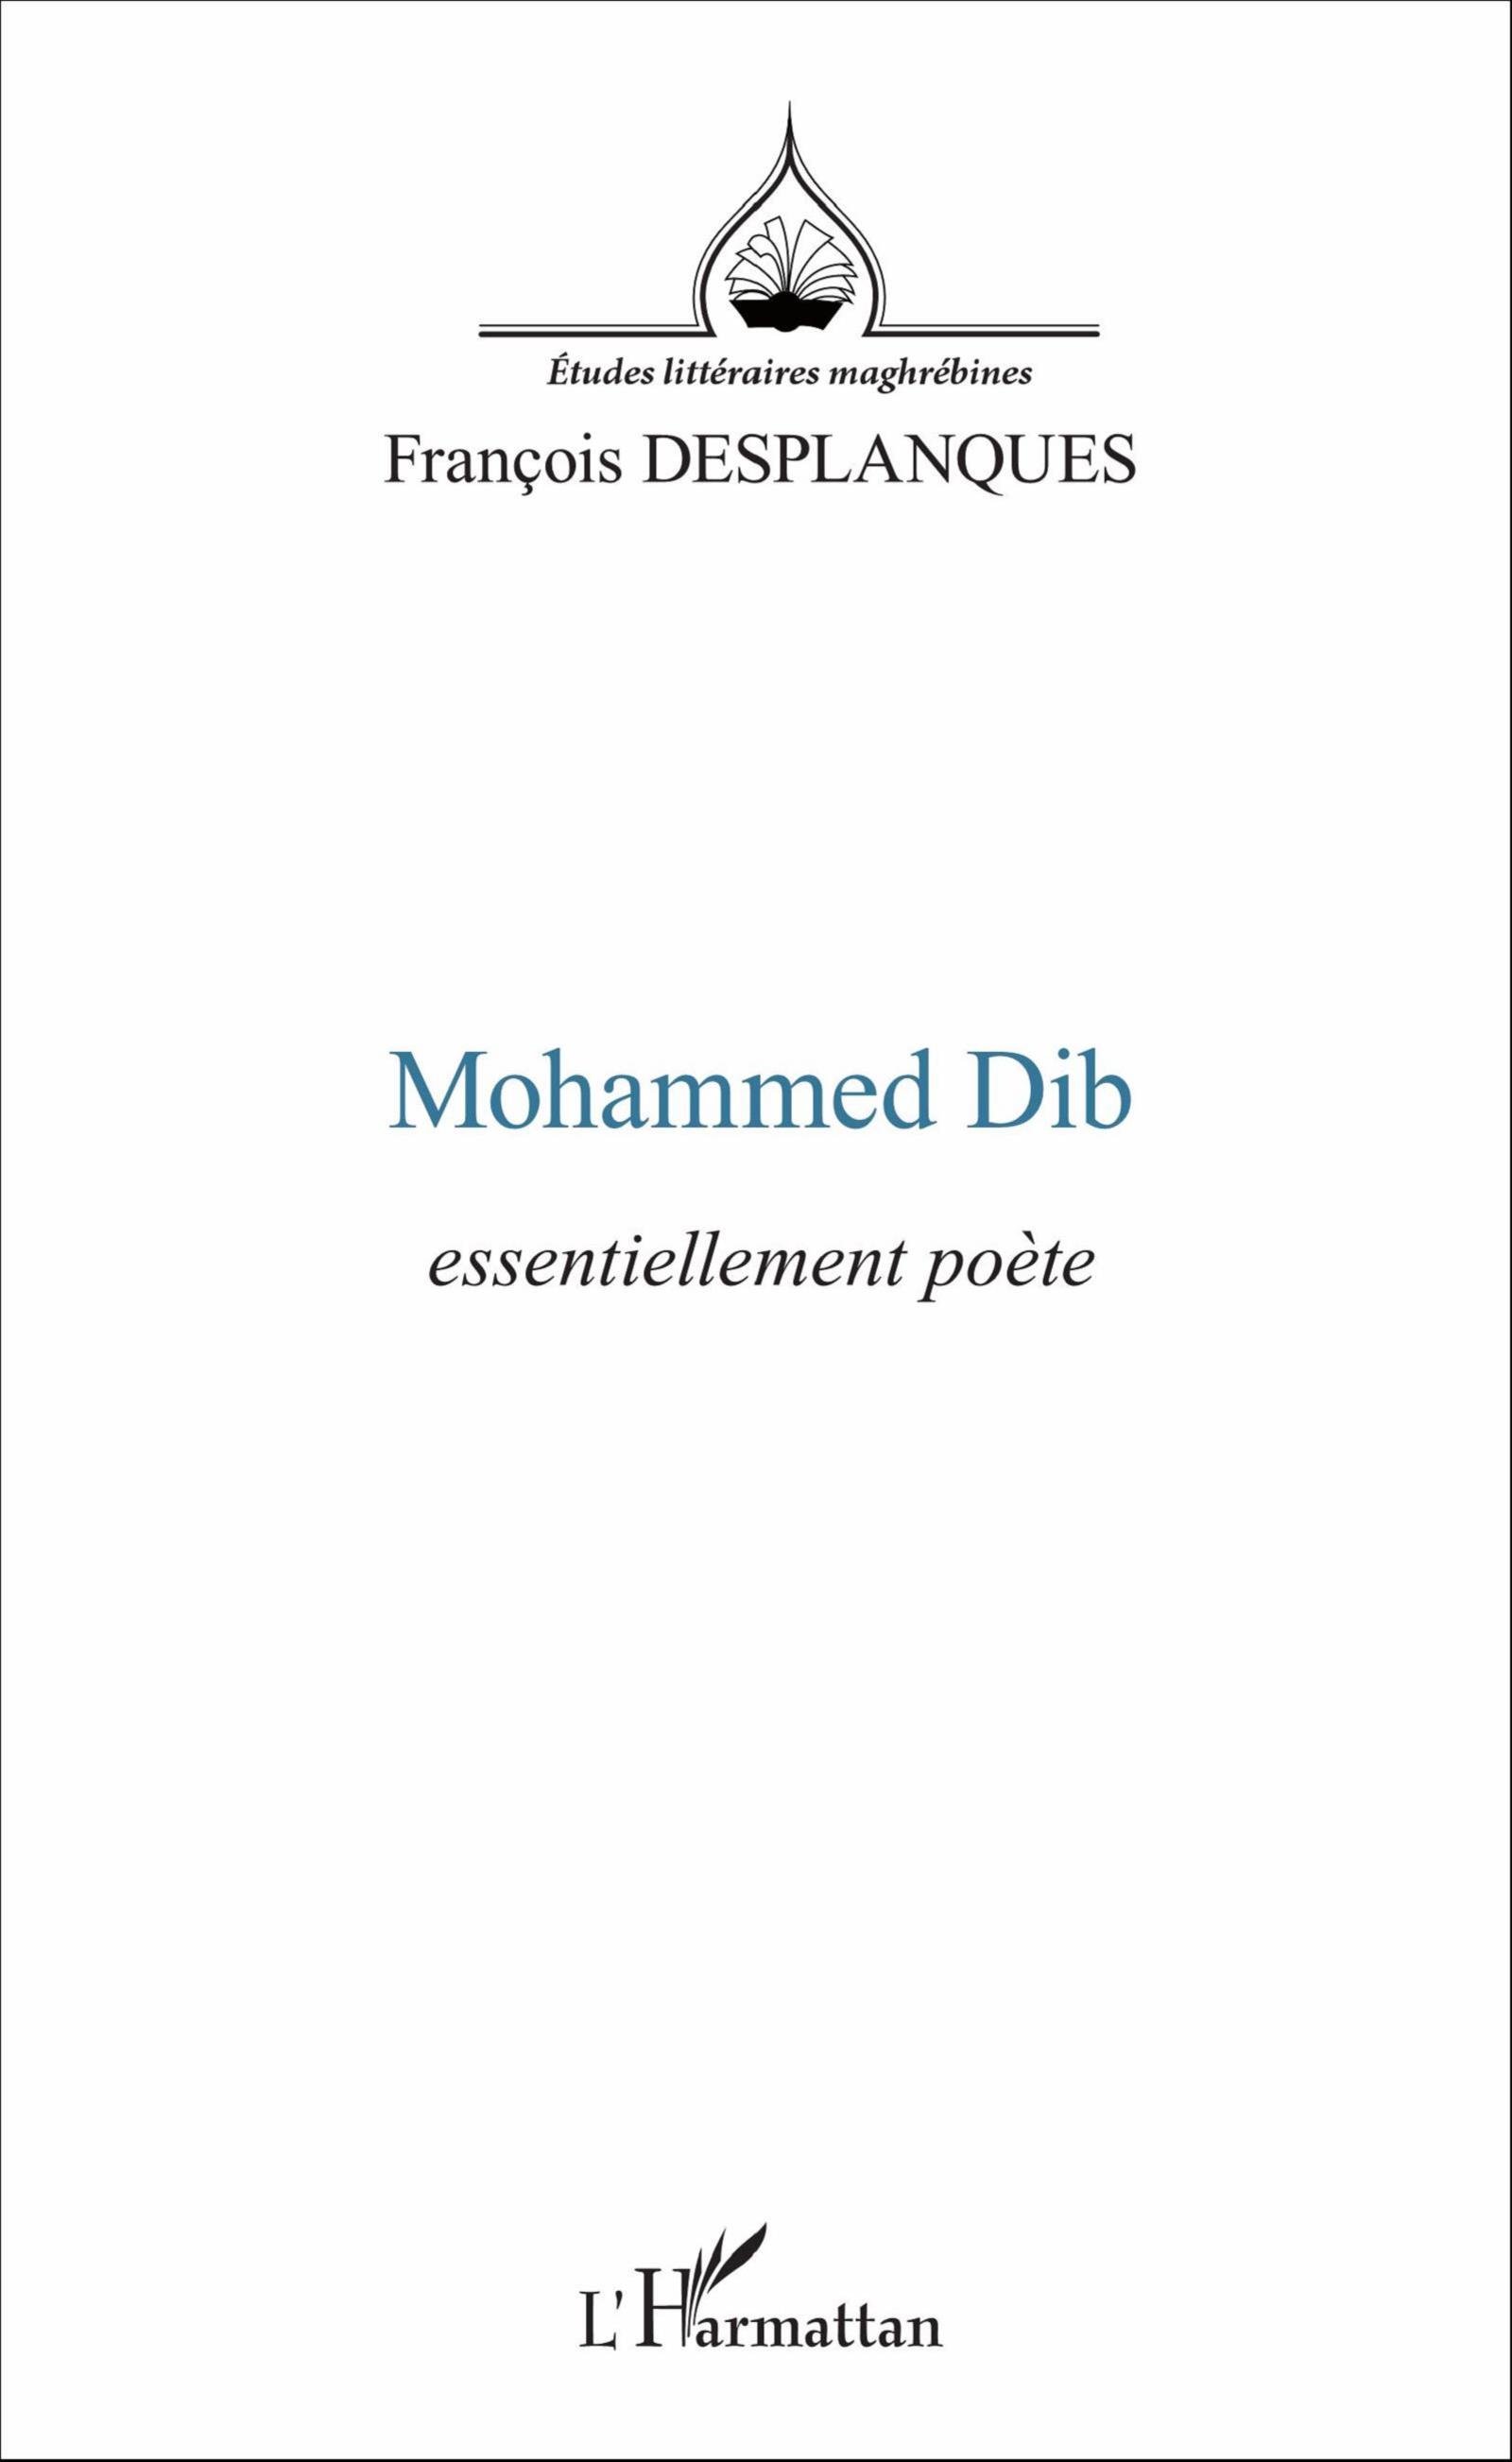 F. Desplanques,  Mohammed Dib : essentiellement poète